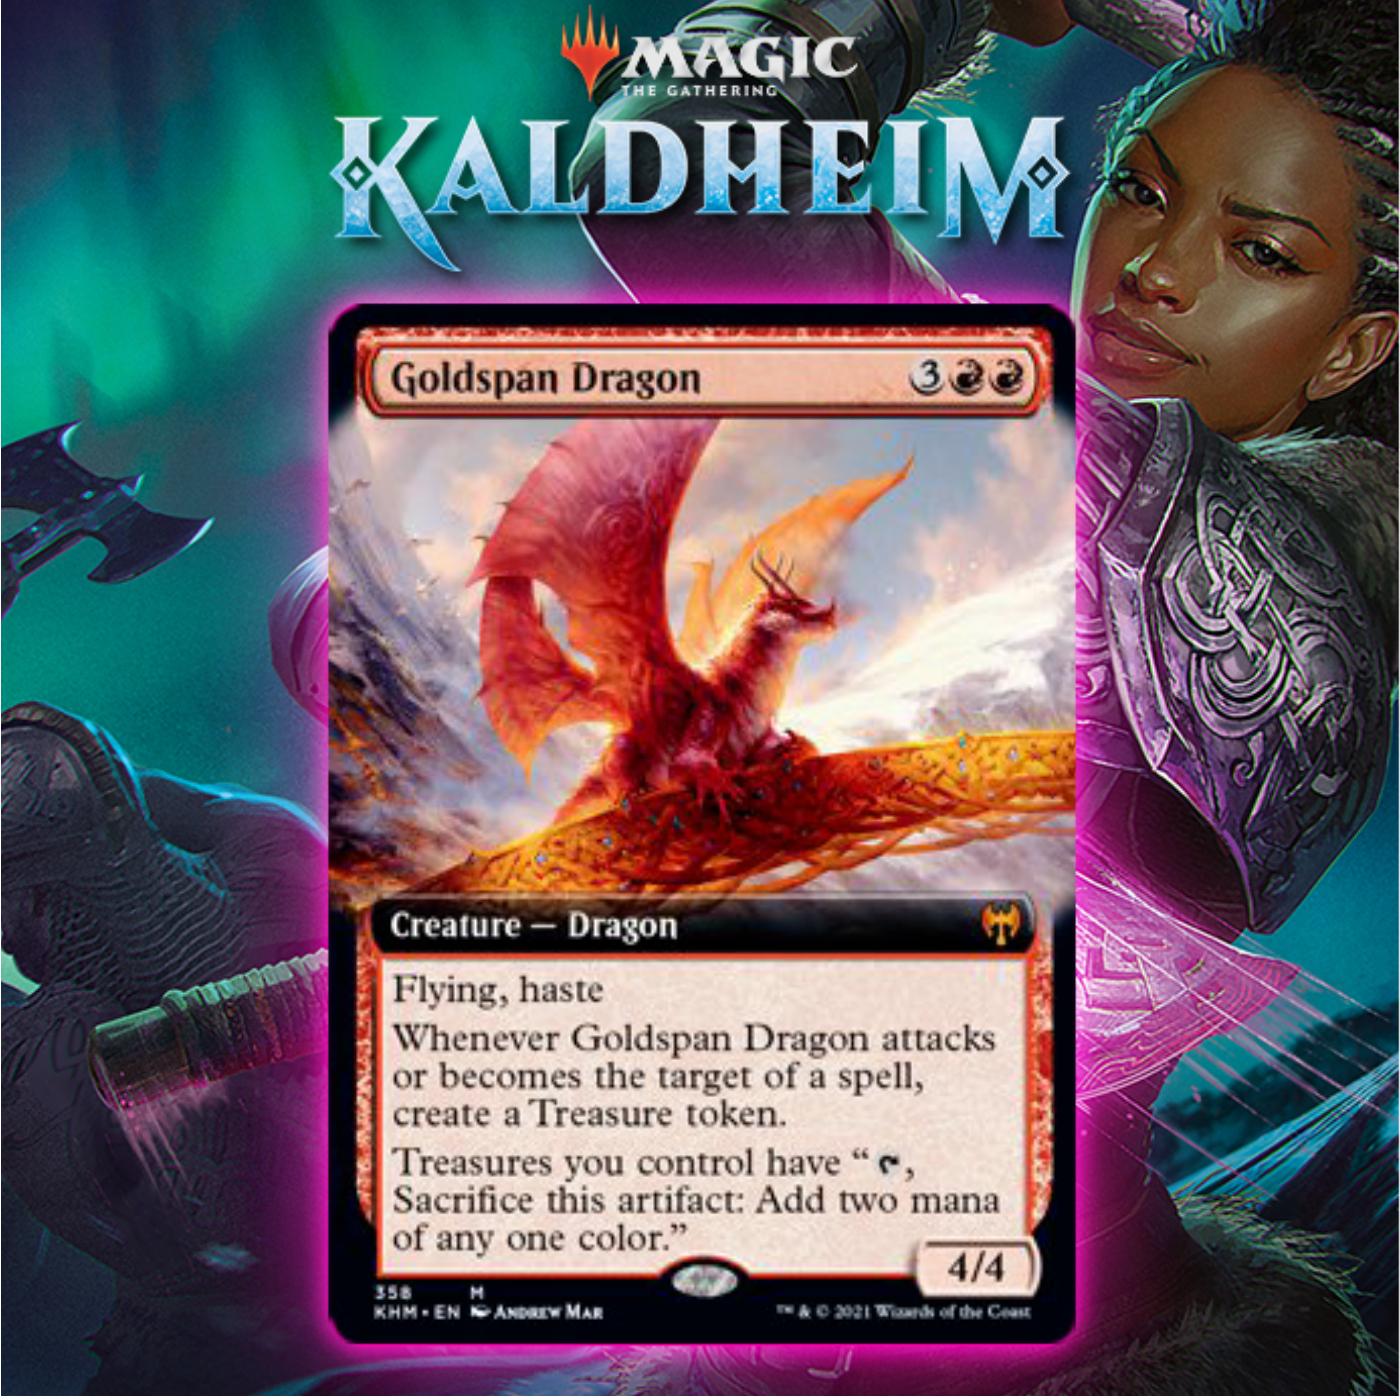 Bringing Glory Back To Dragons With Goldspan Dragon In Kaldheim Standard